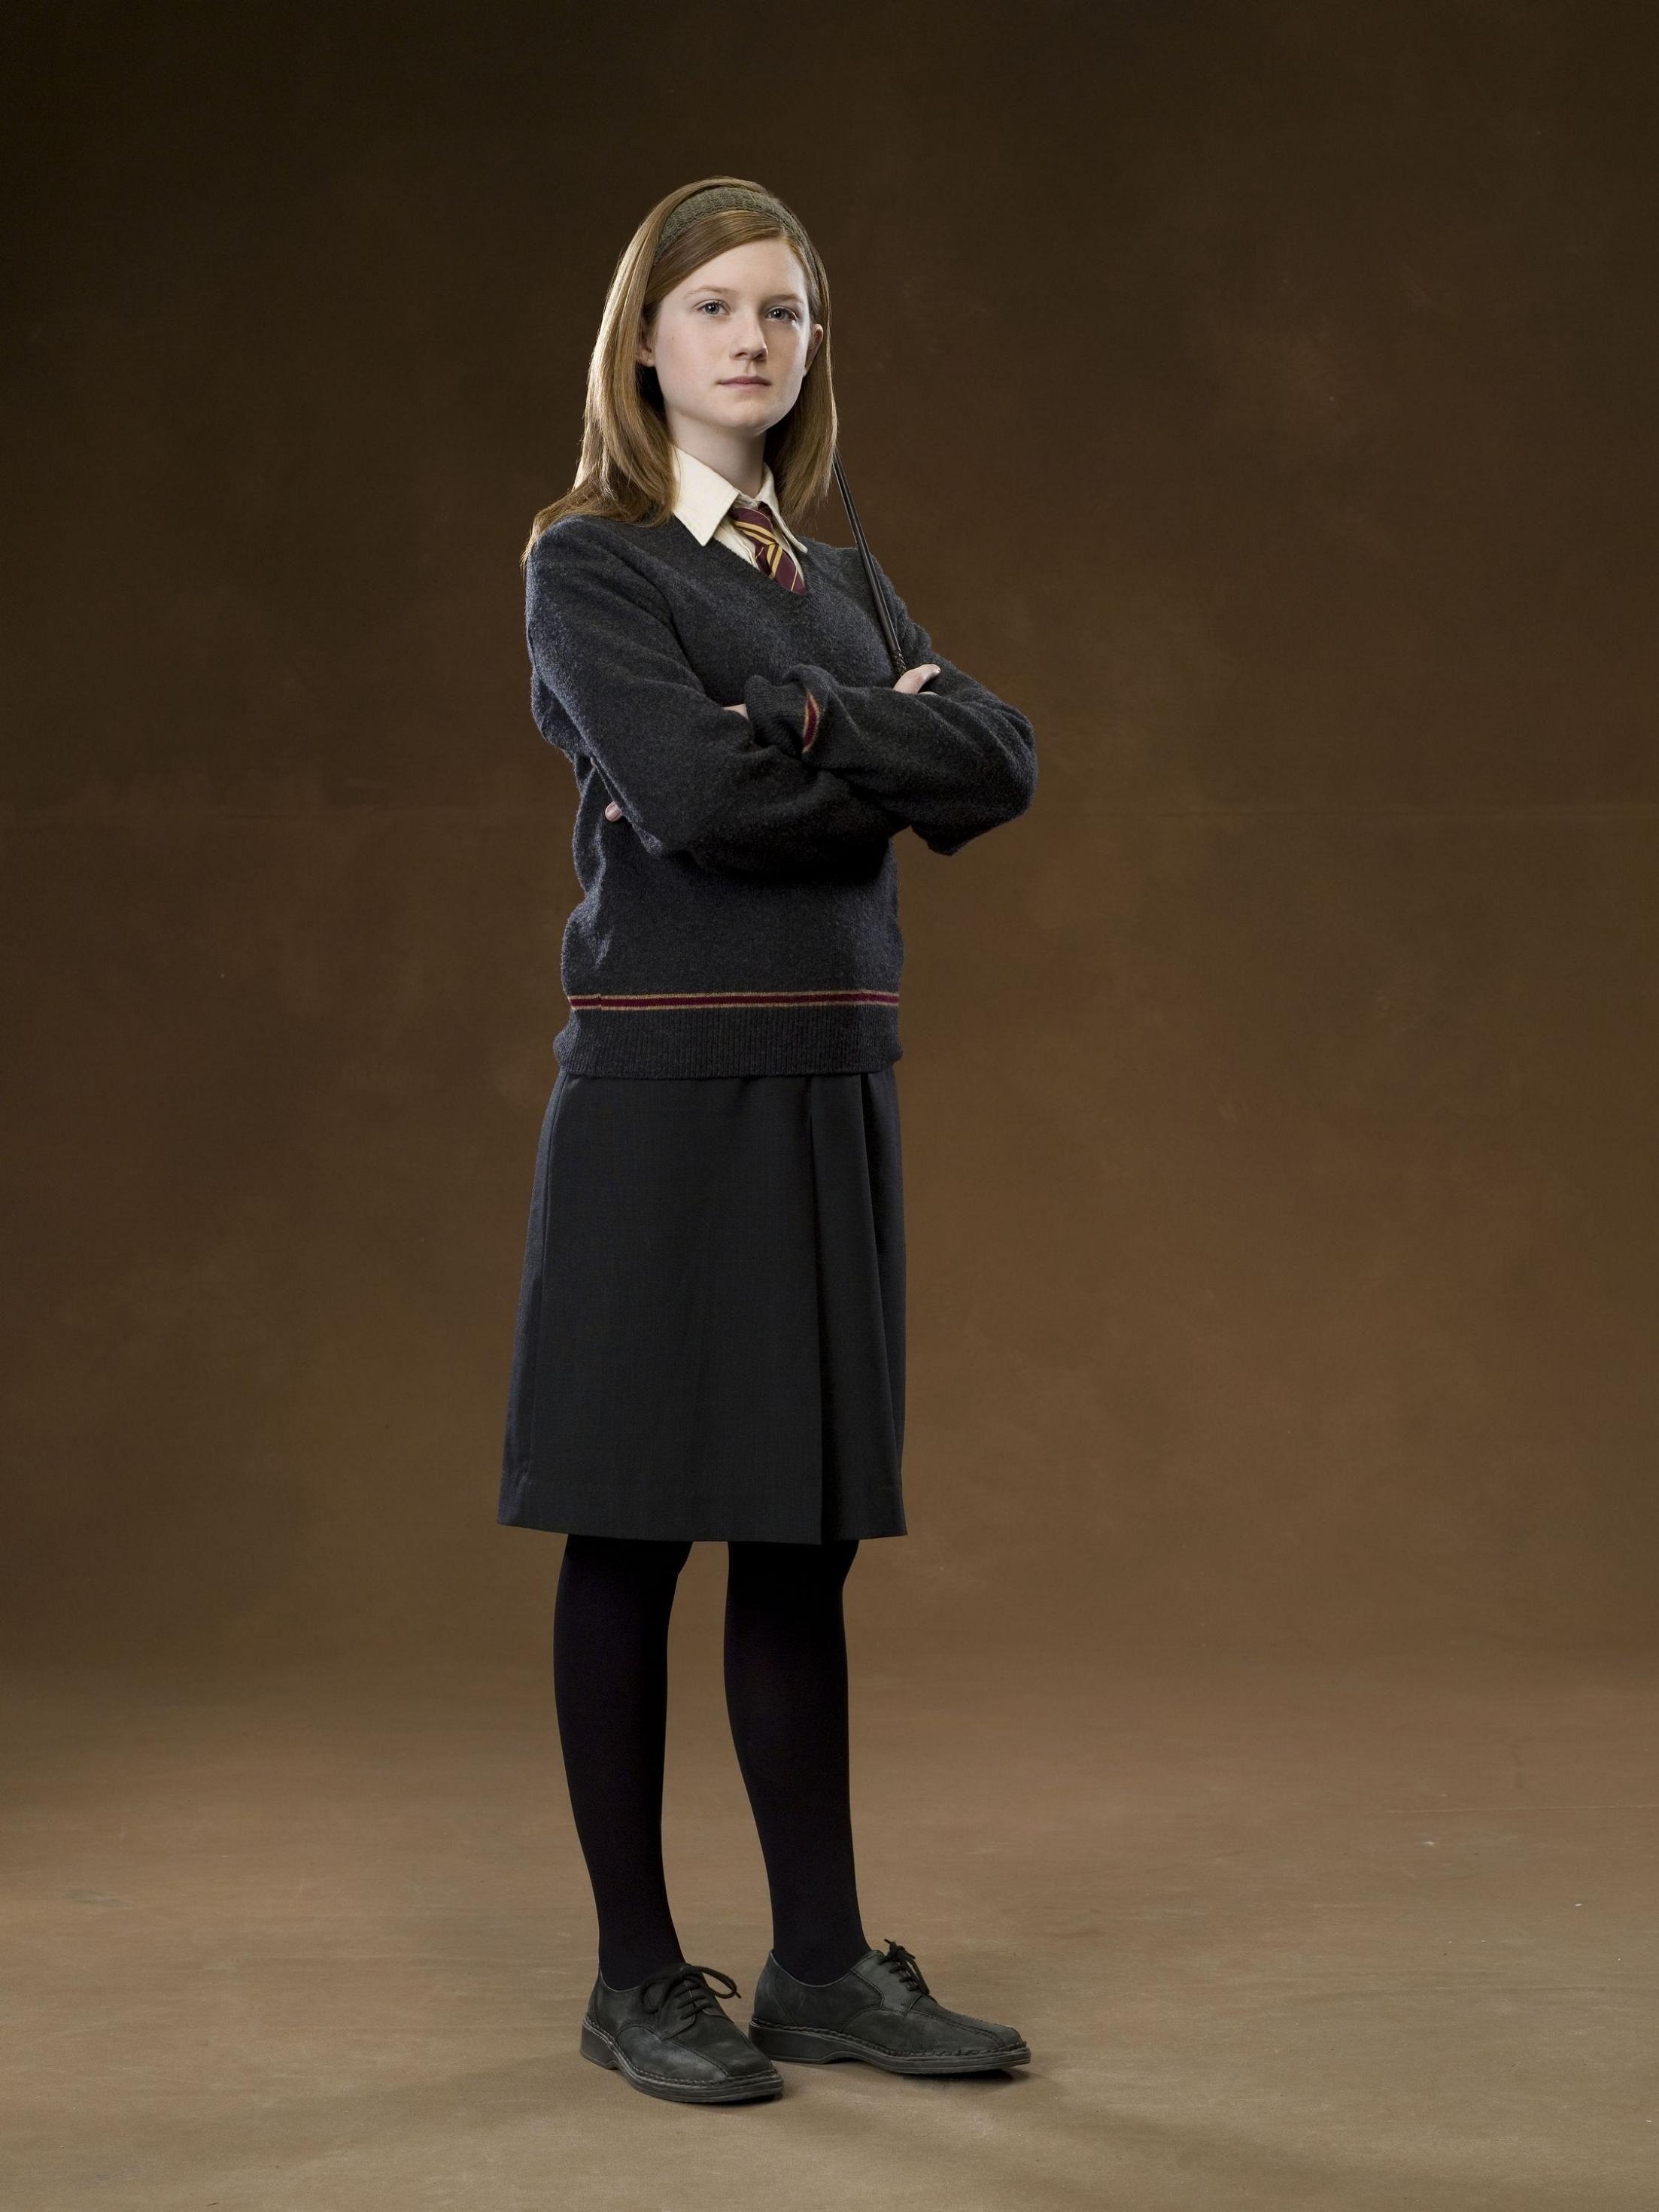 ginny weasley | Ginny Weasley | Harry Potter | Pinterest | Mottowoche